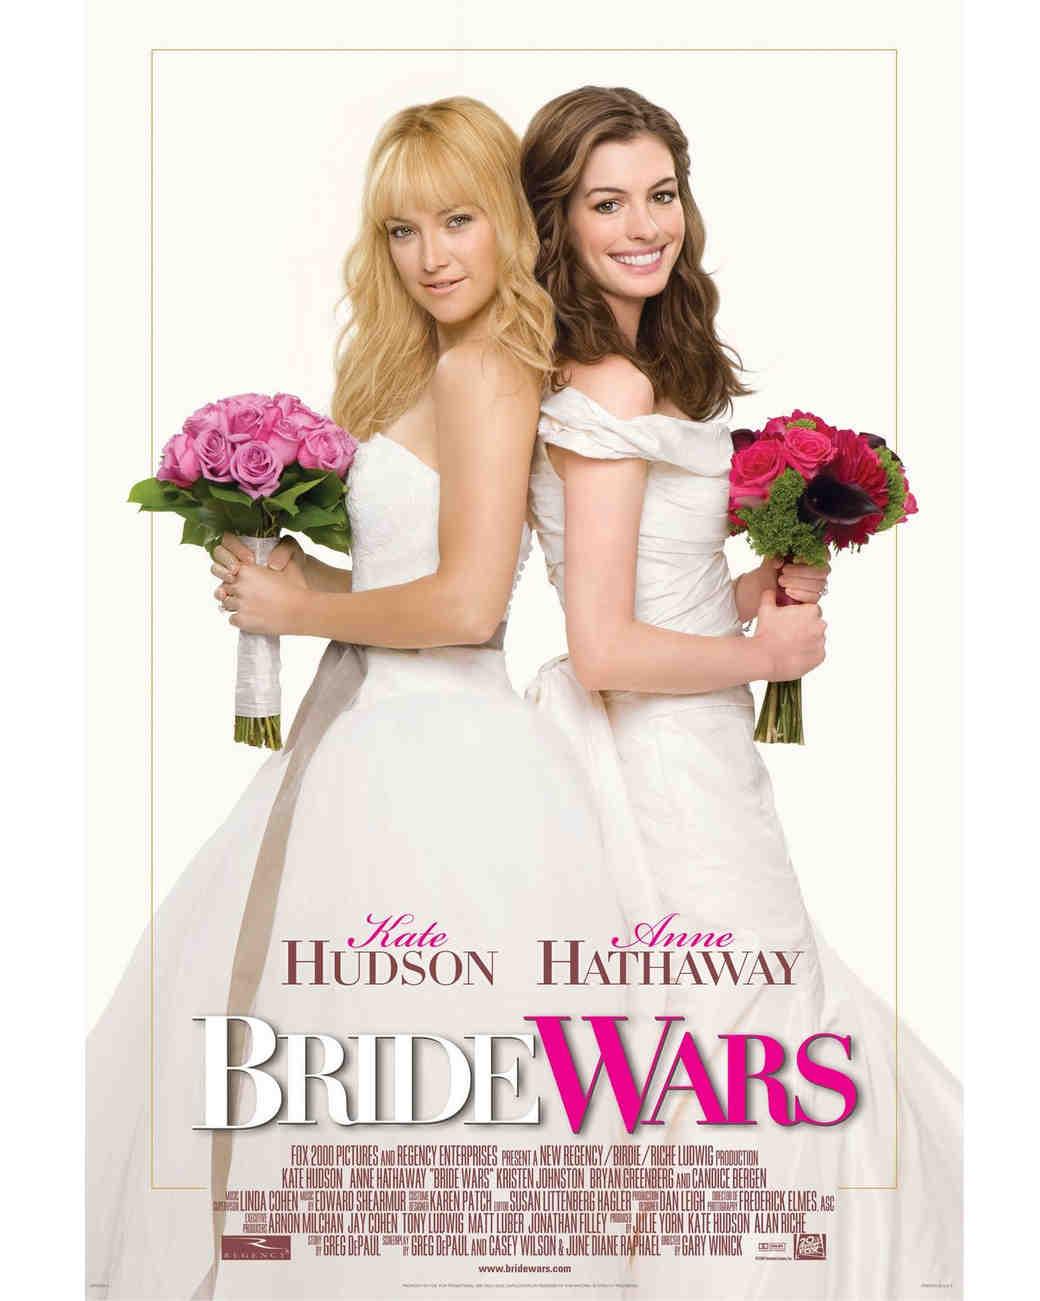 wedding-movies-bride-wars-1115.jpg